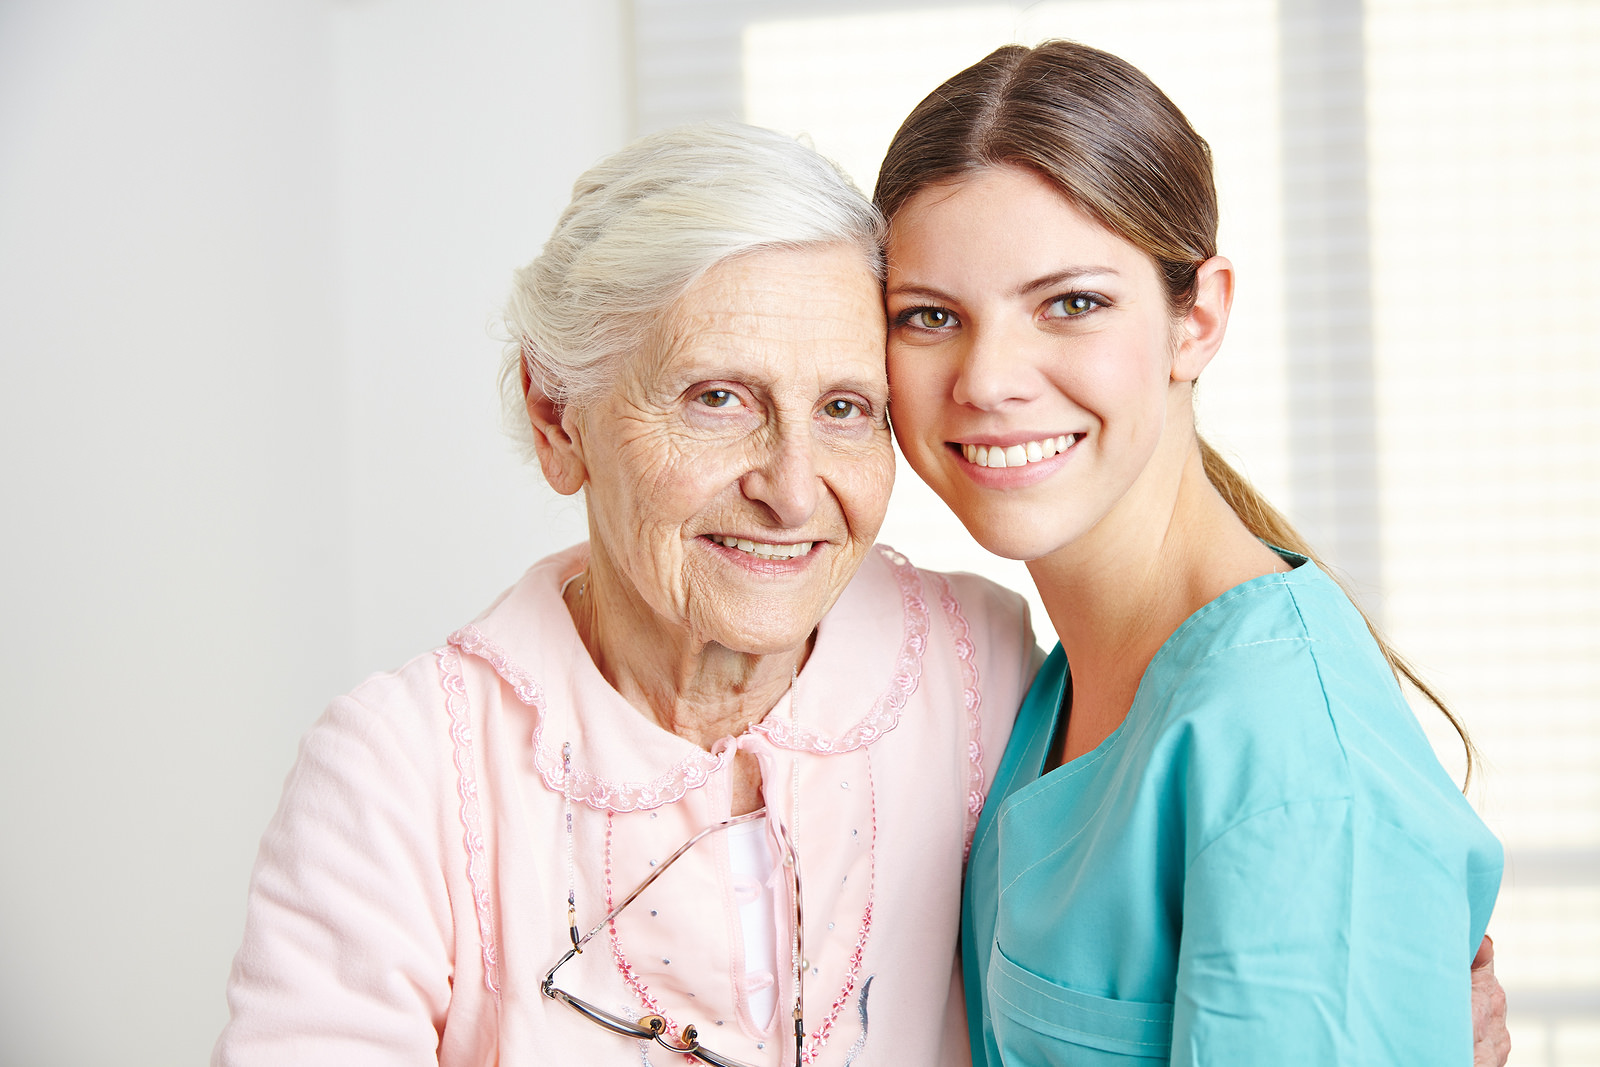 elder care Helping caregivers of elderly parents find answers on senior housing, home care, elder care, caregiver support, senior financial and legal information.